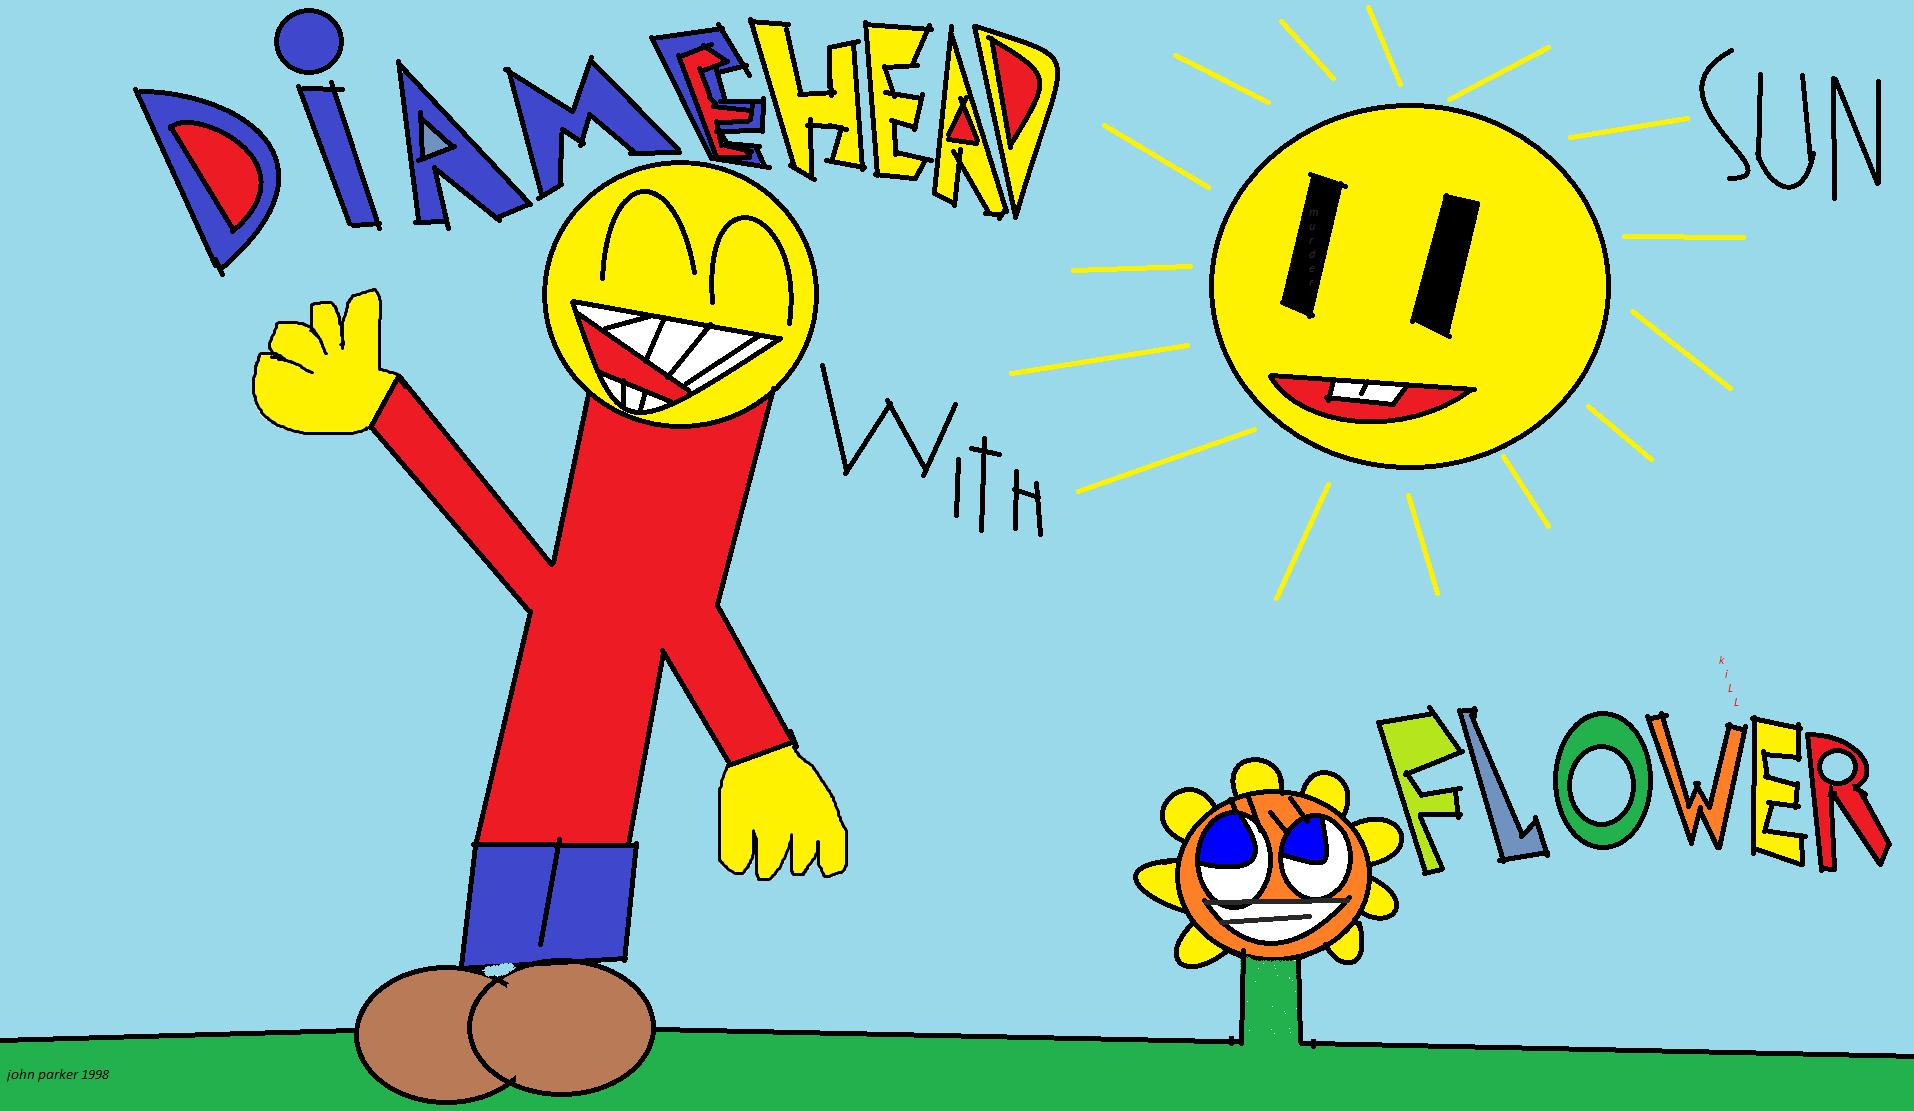 DiameHead 1998